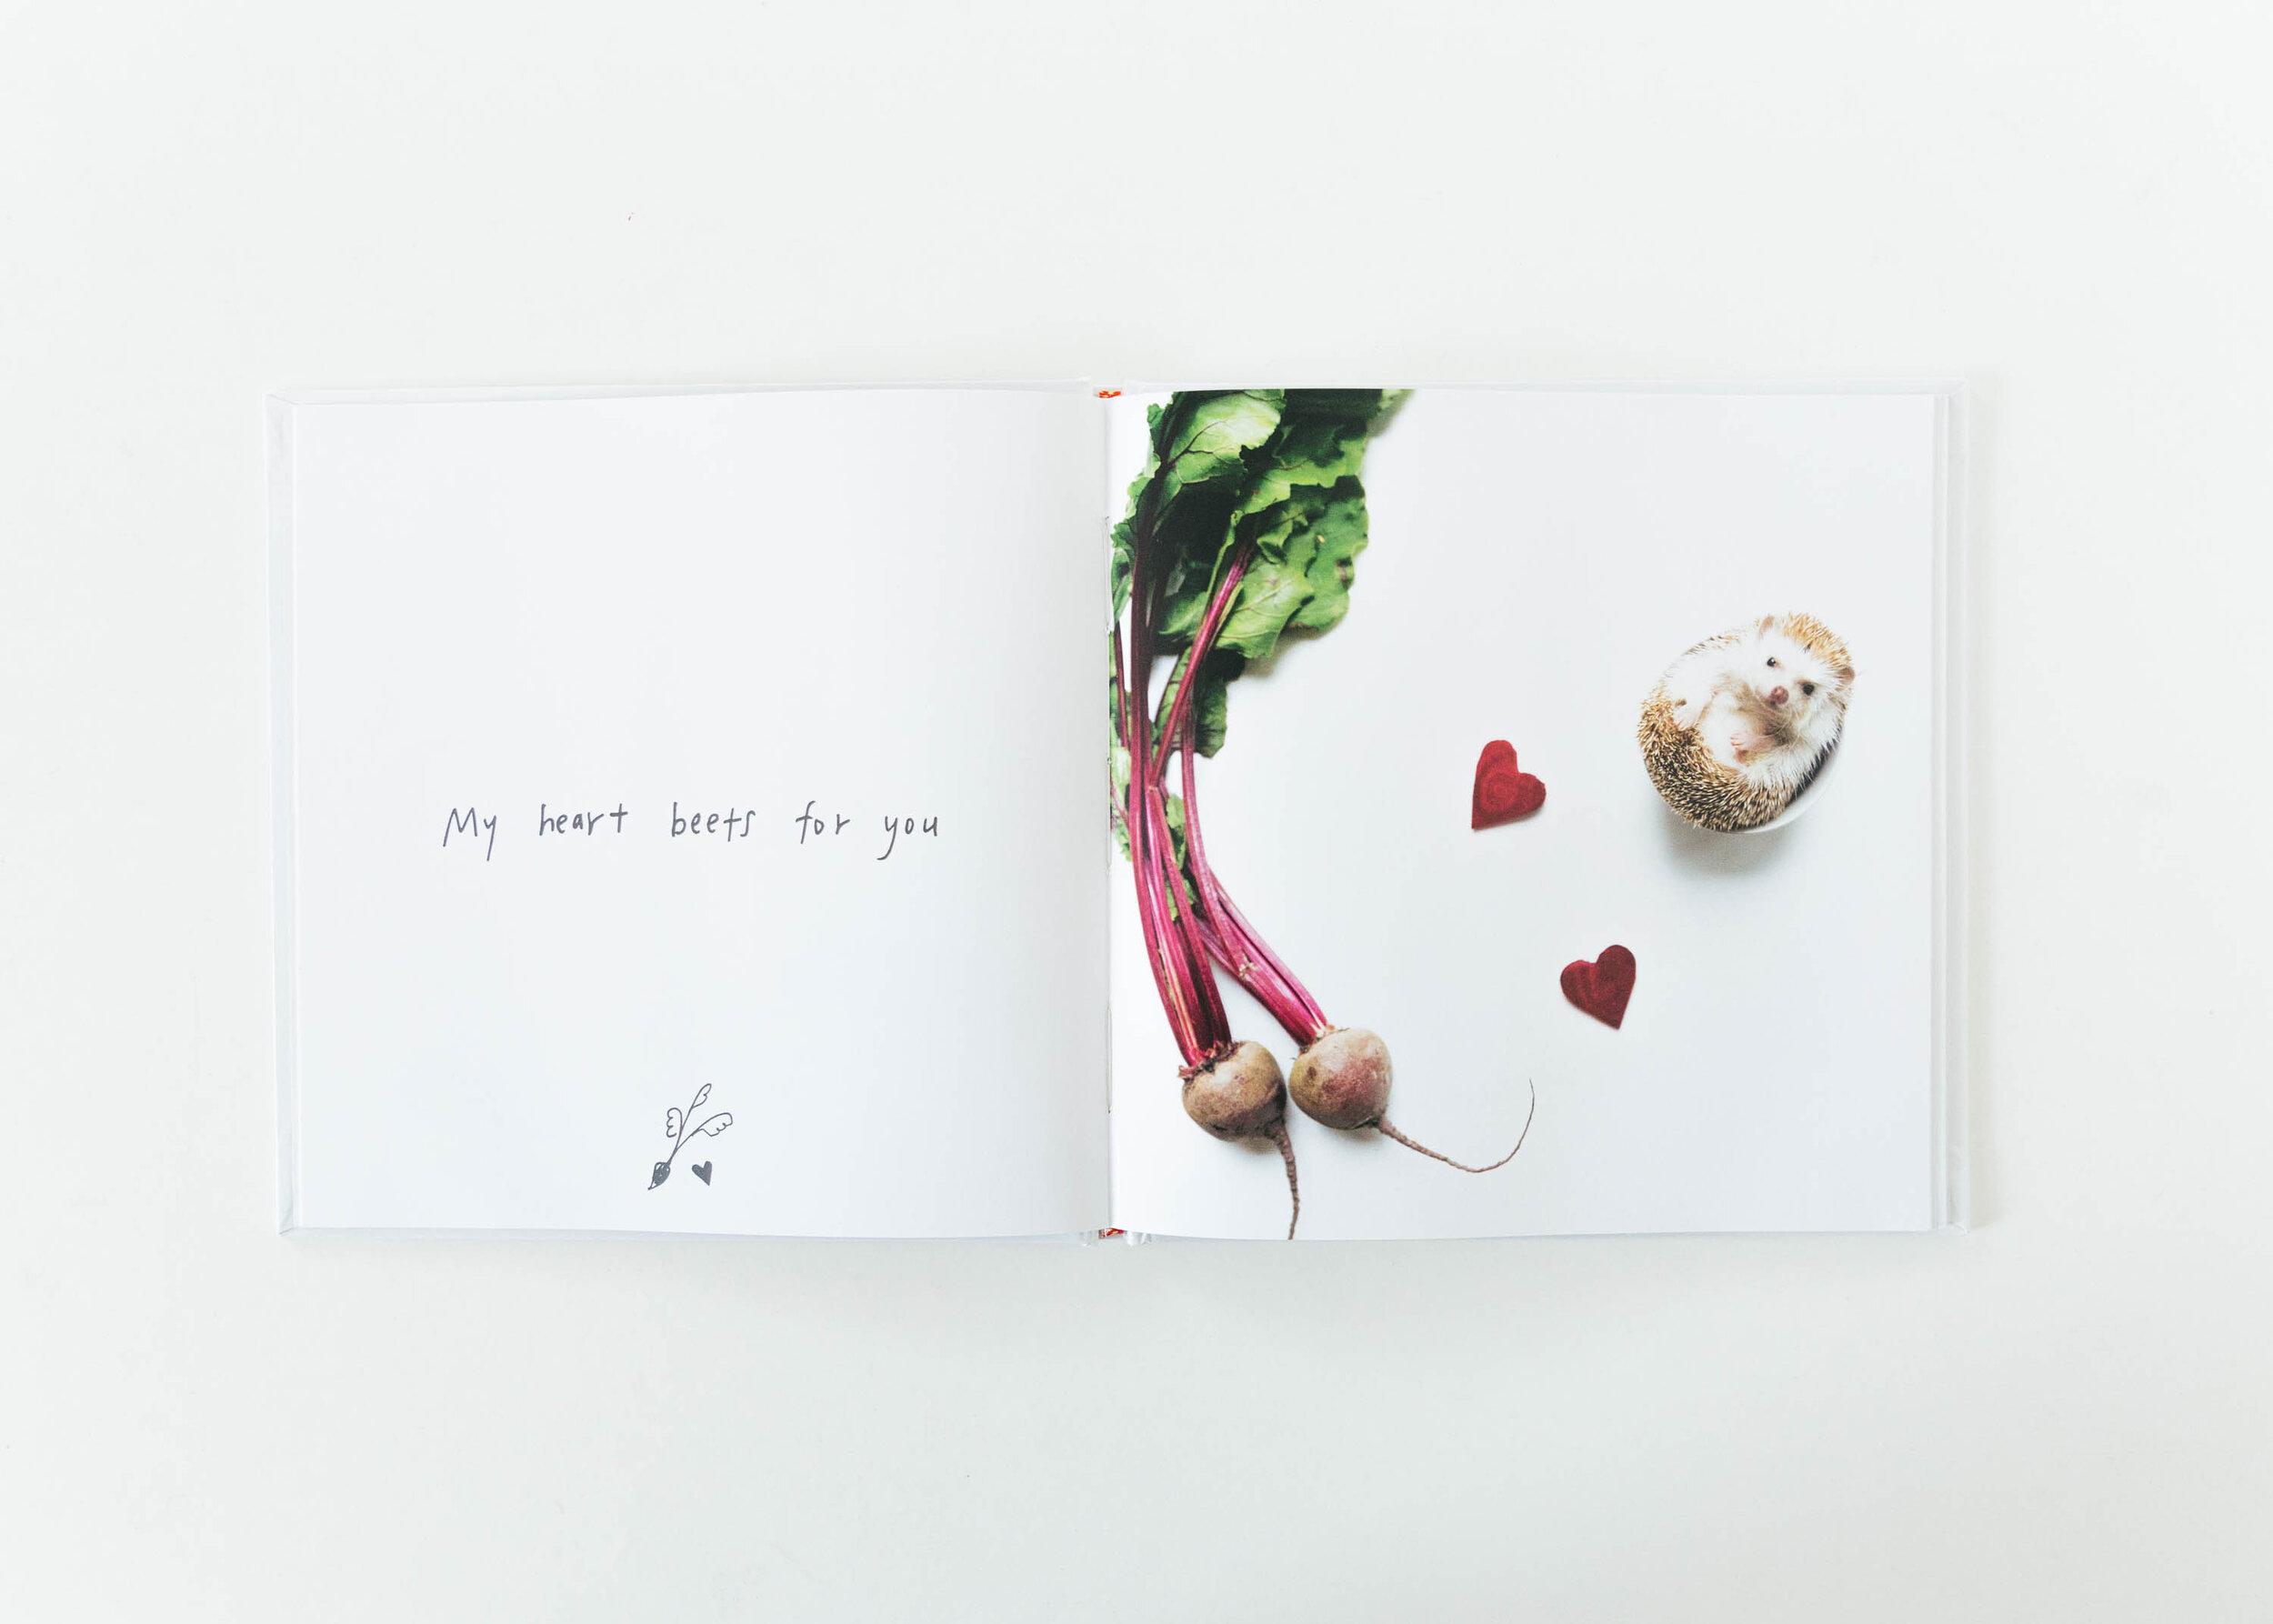 muji_amelia_hedgehog-book-3.jpg